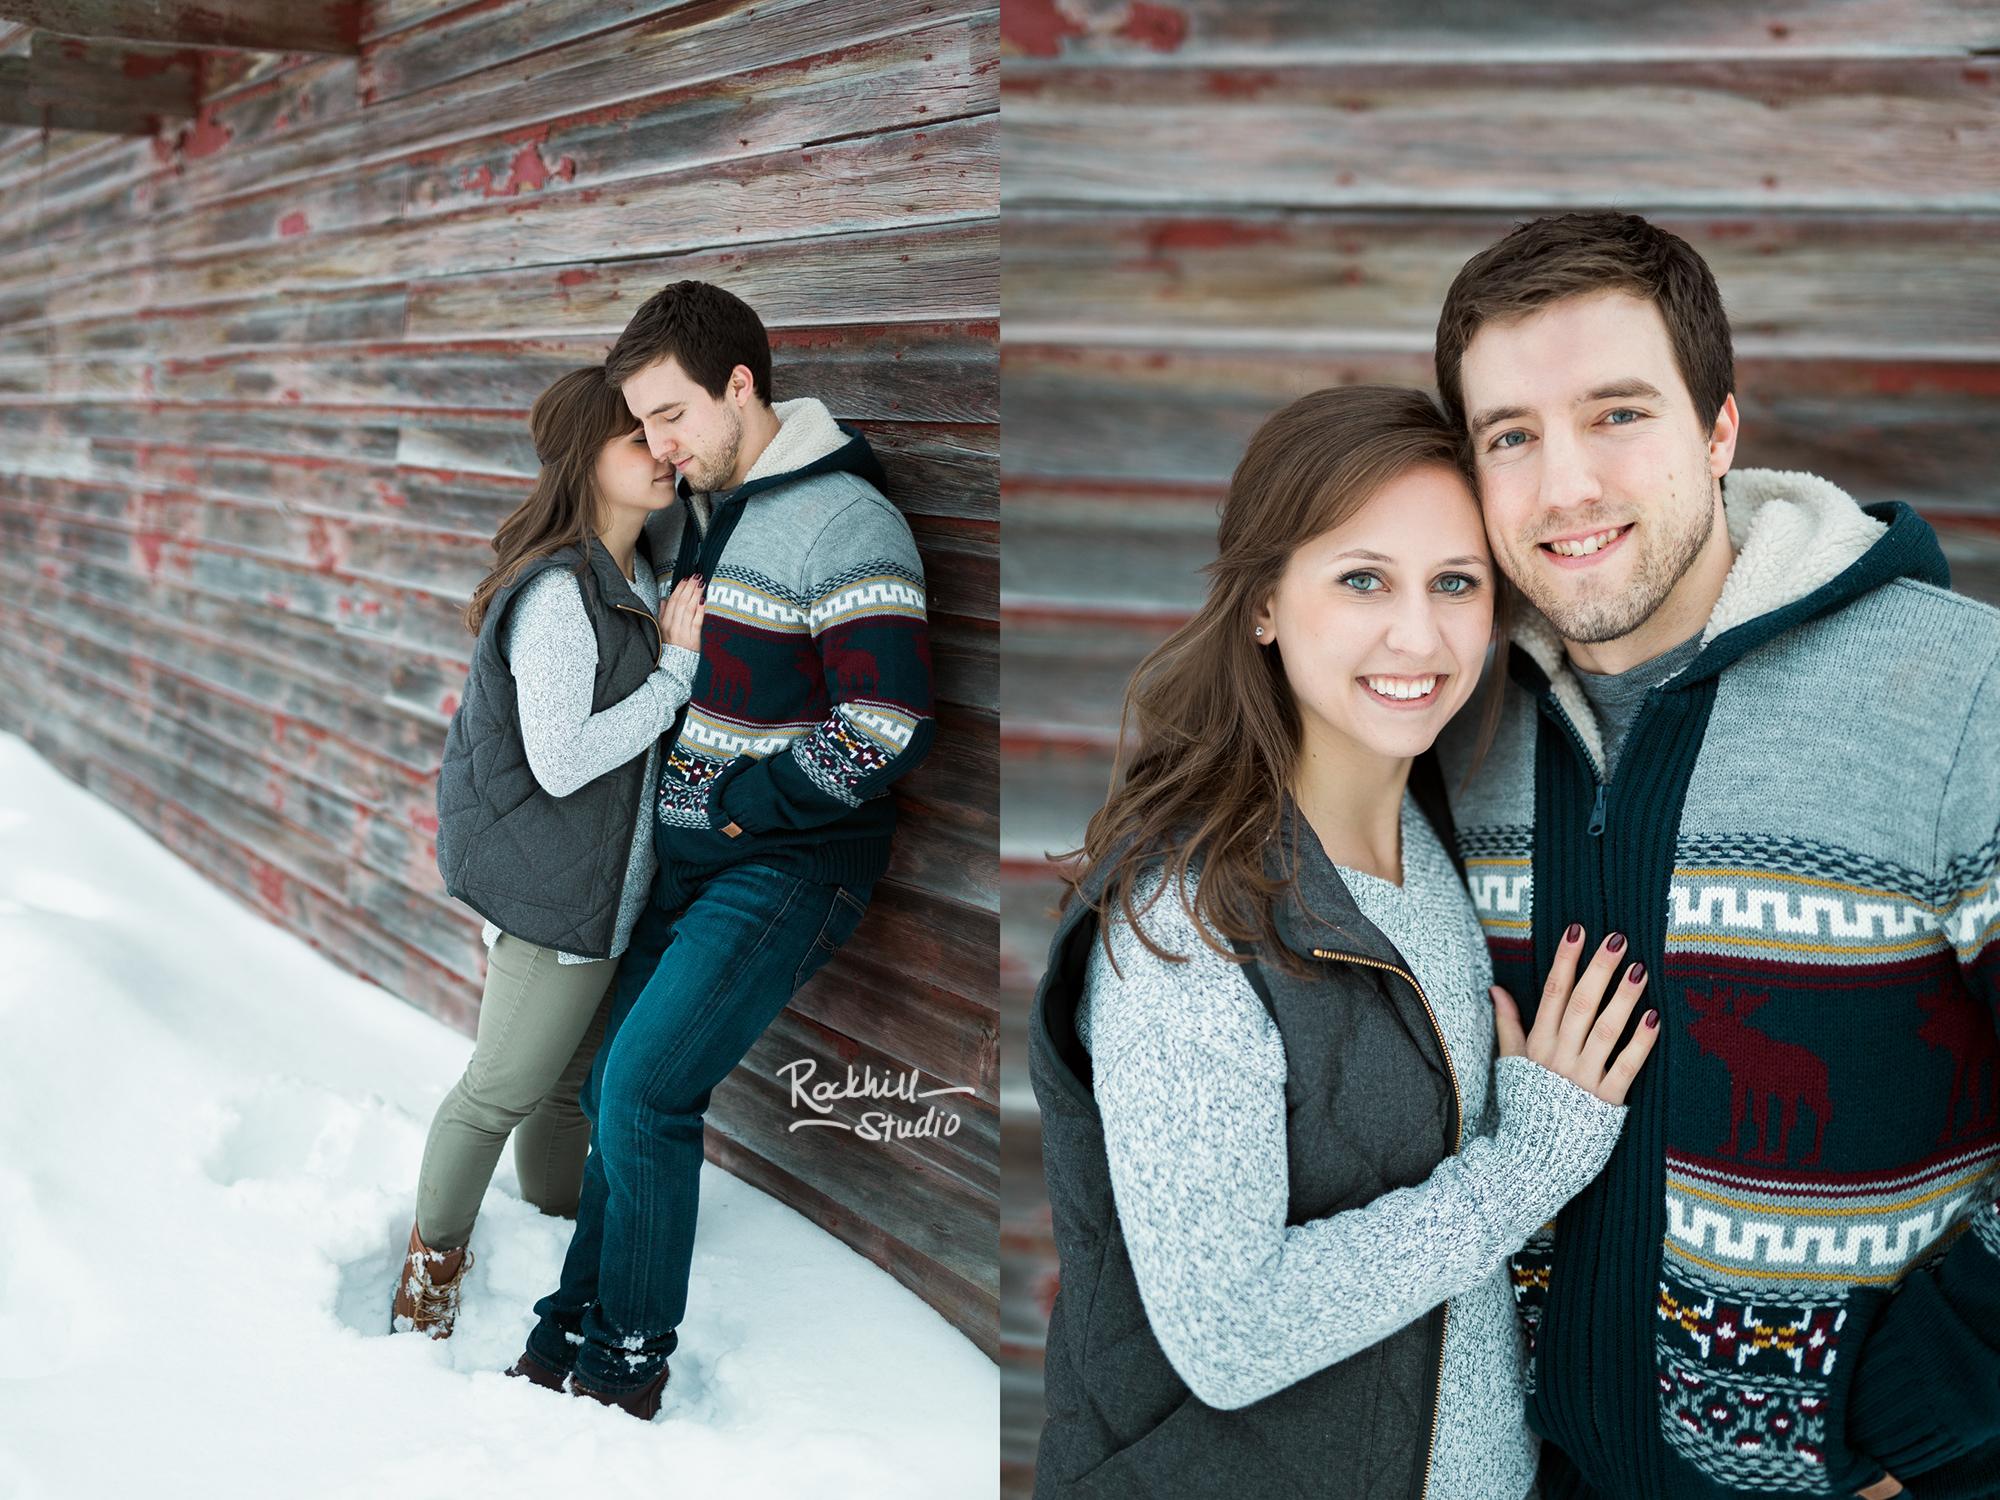 rockhill-studio-northern-michigan-engagement-photography-upper-peninsula-marquette-wedding-winter-30.jpg